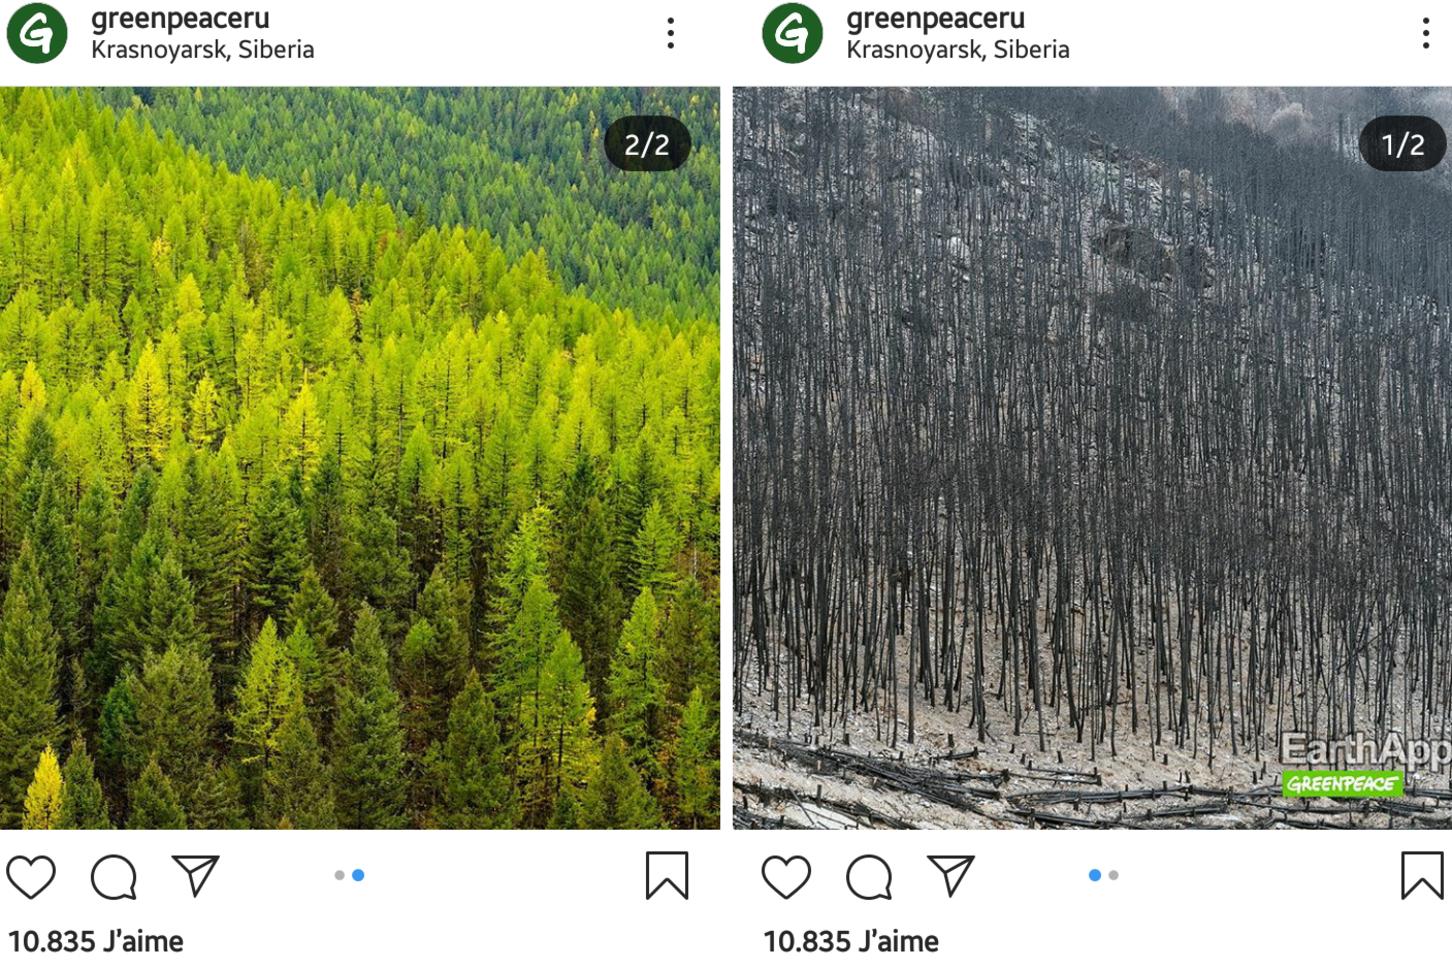 Capture d'écran Instagram, greenpeaceru